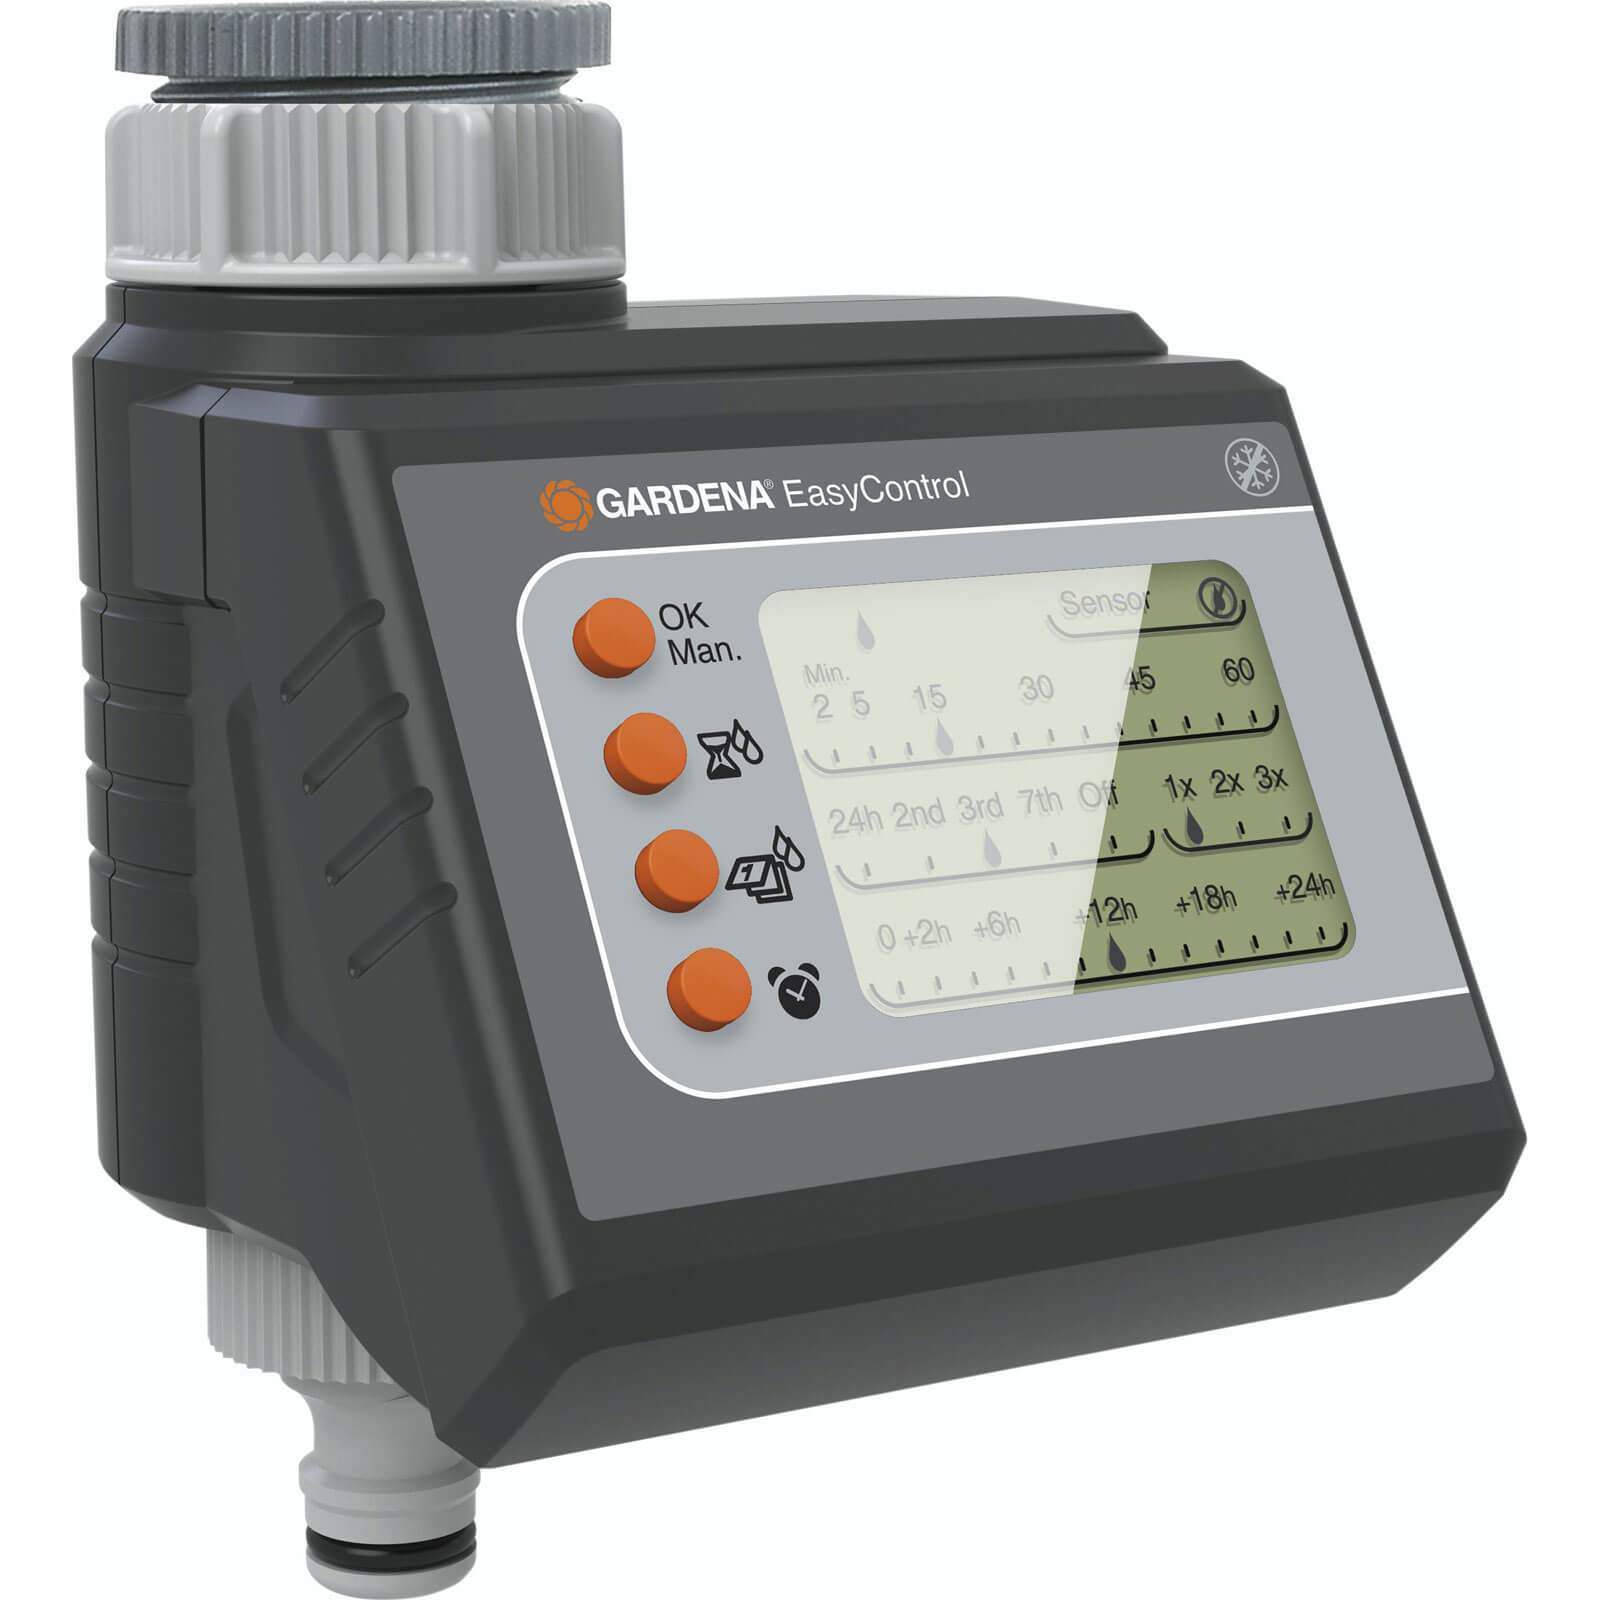 Gardena EasyControl Digital Water Timer with LCD Display